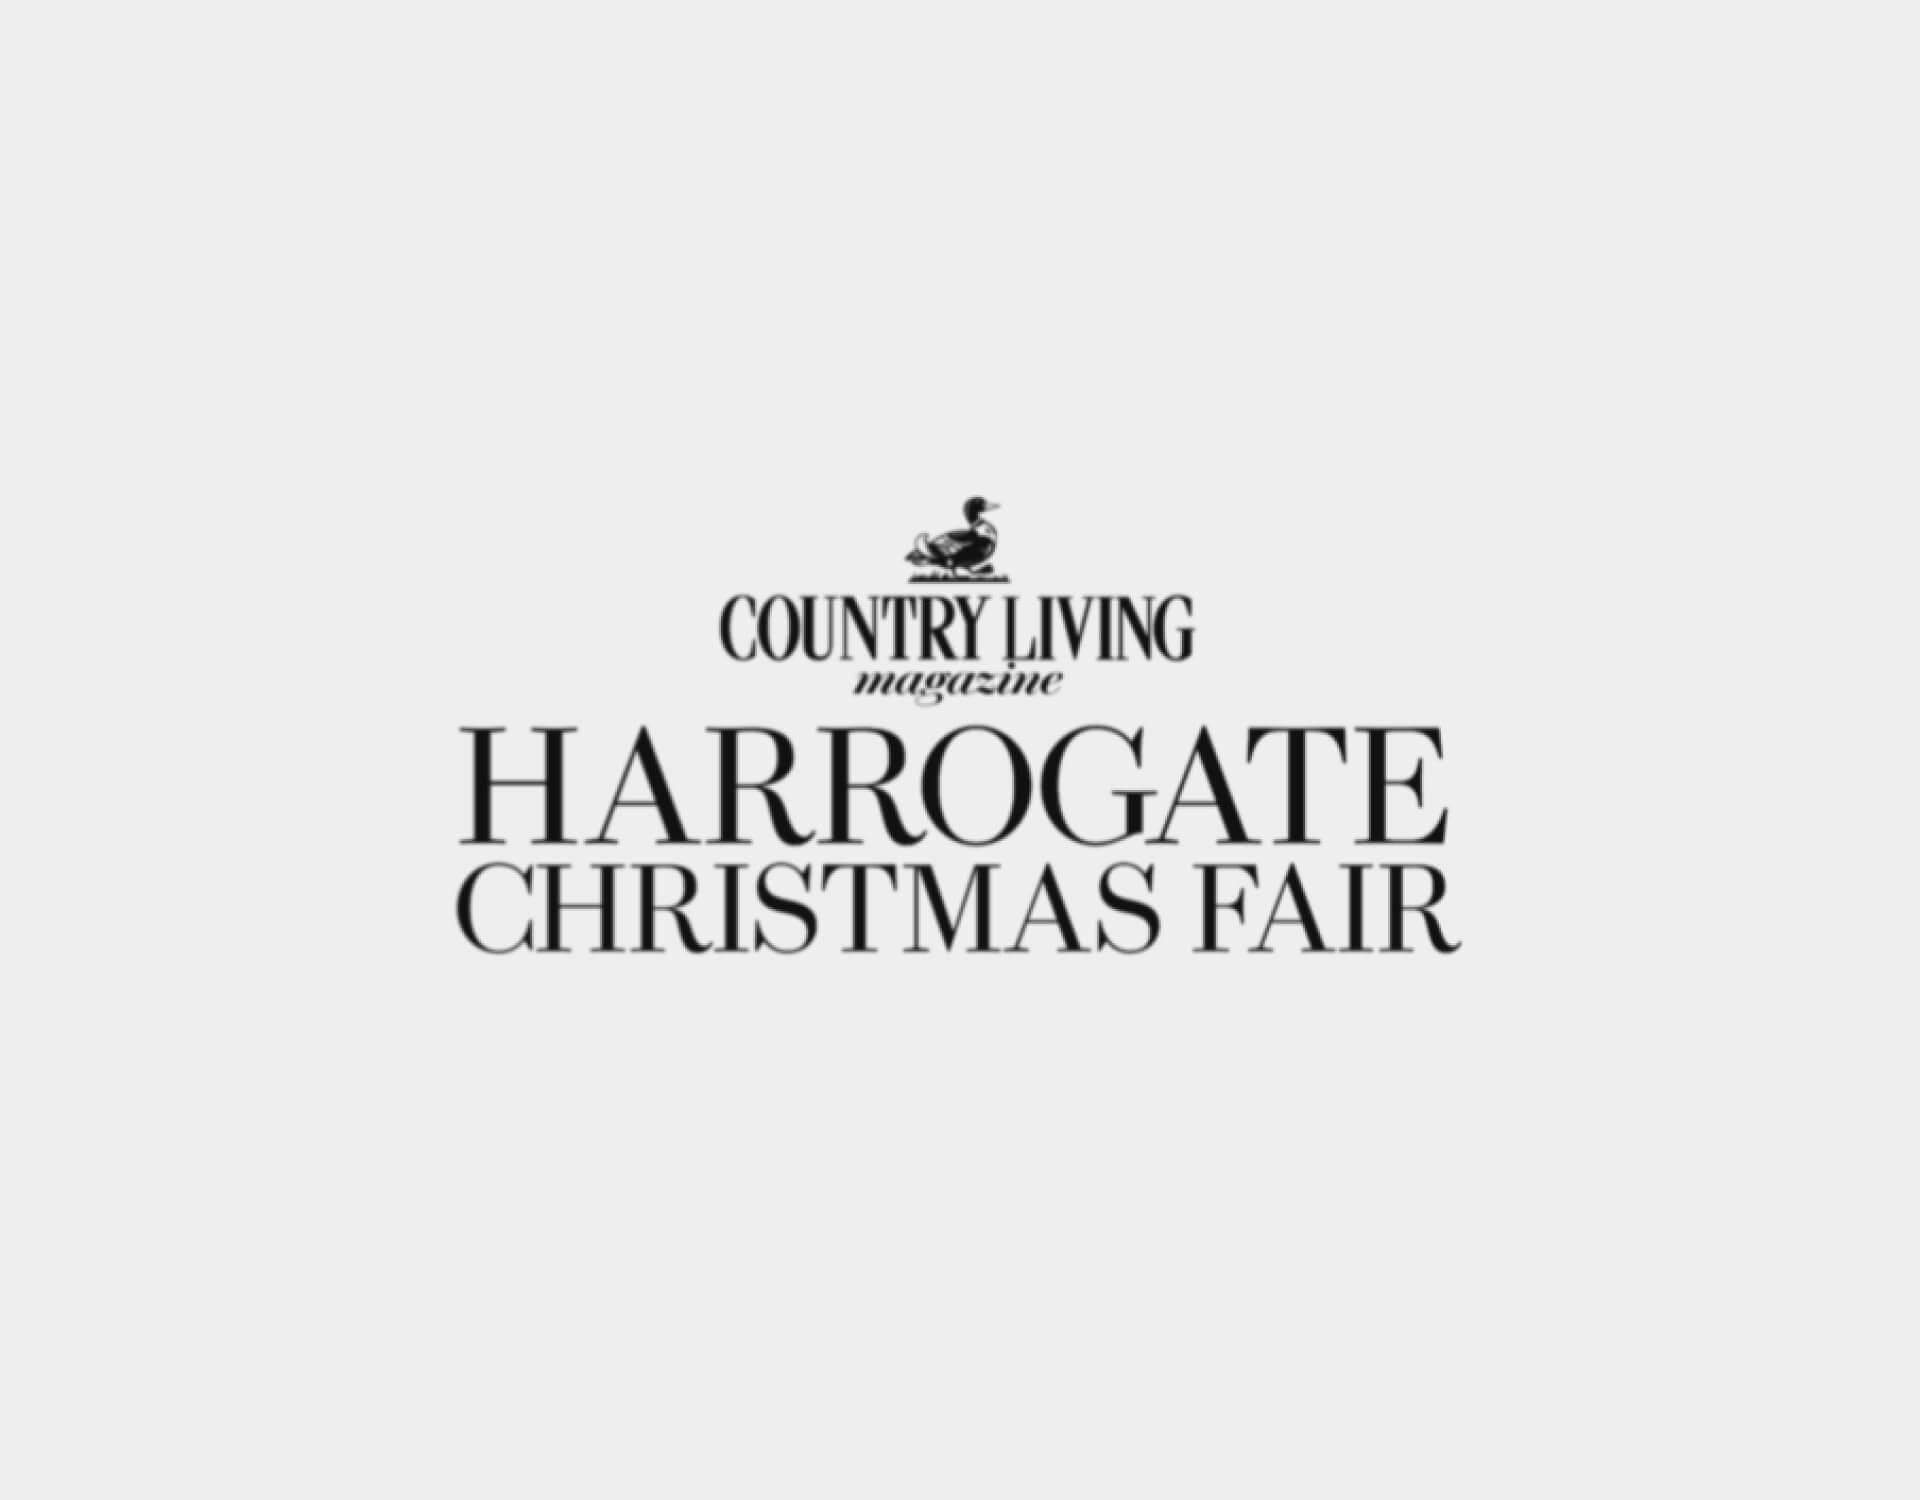 Country Living Fair Harrogate